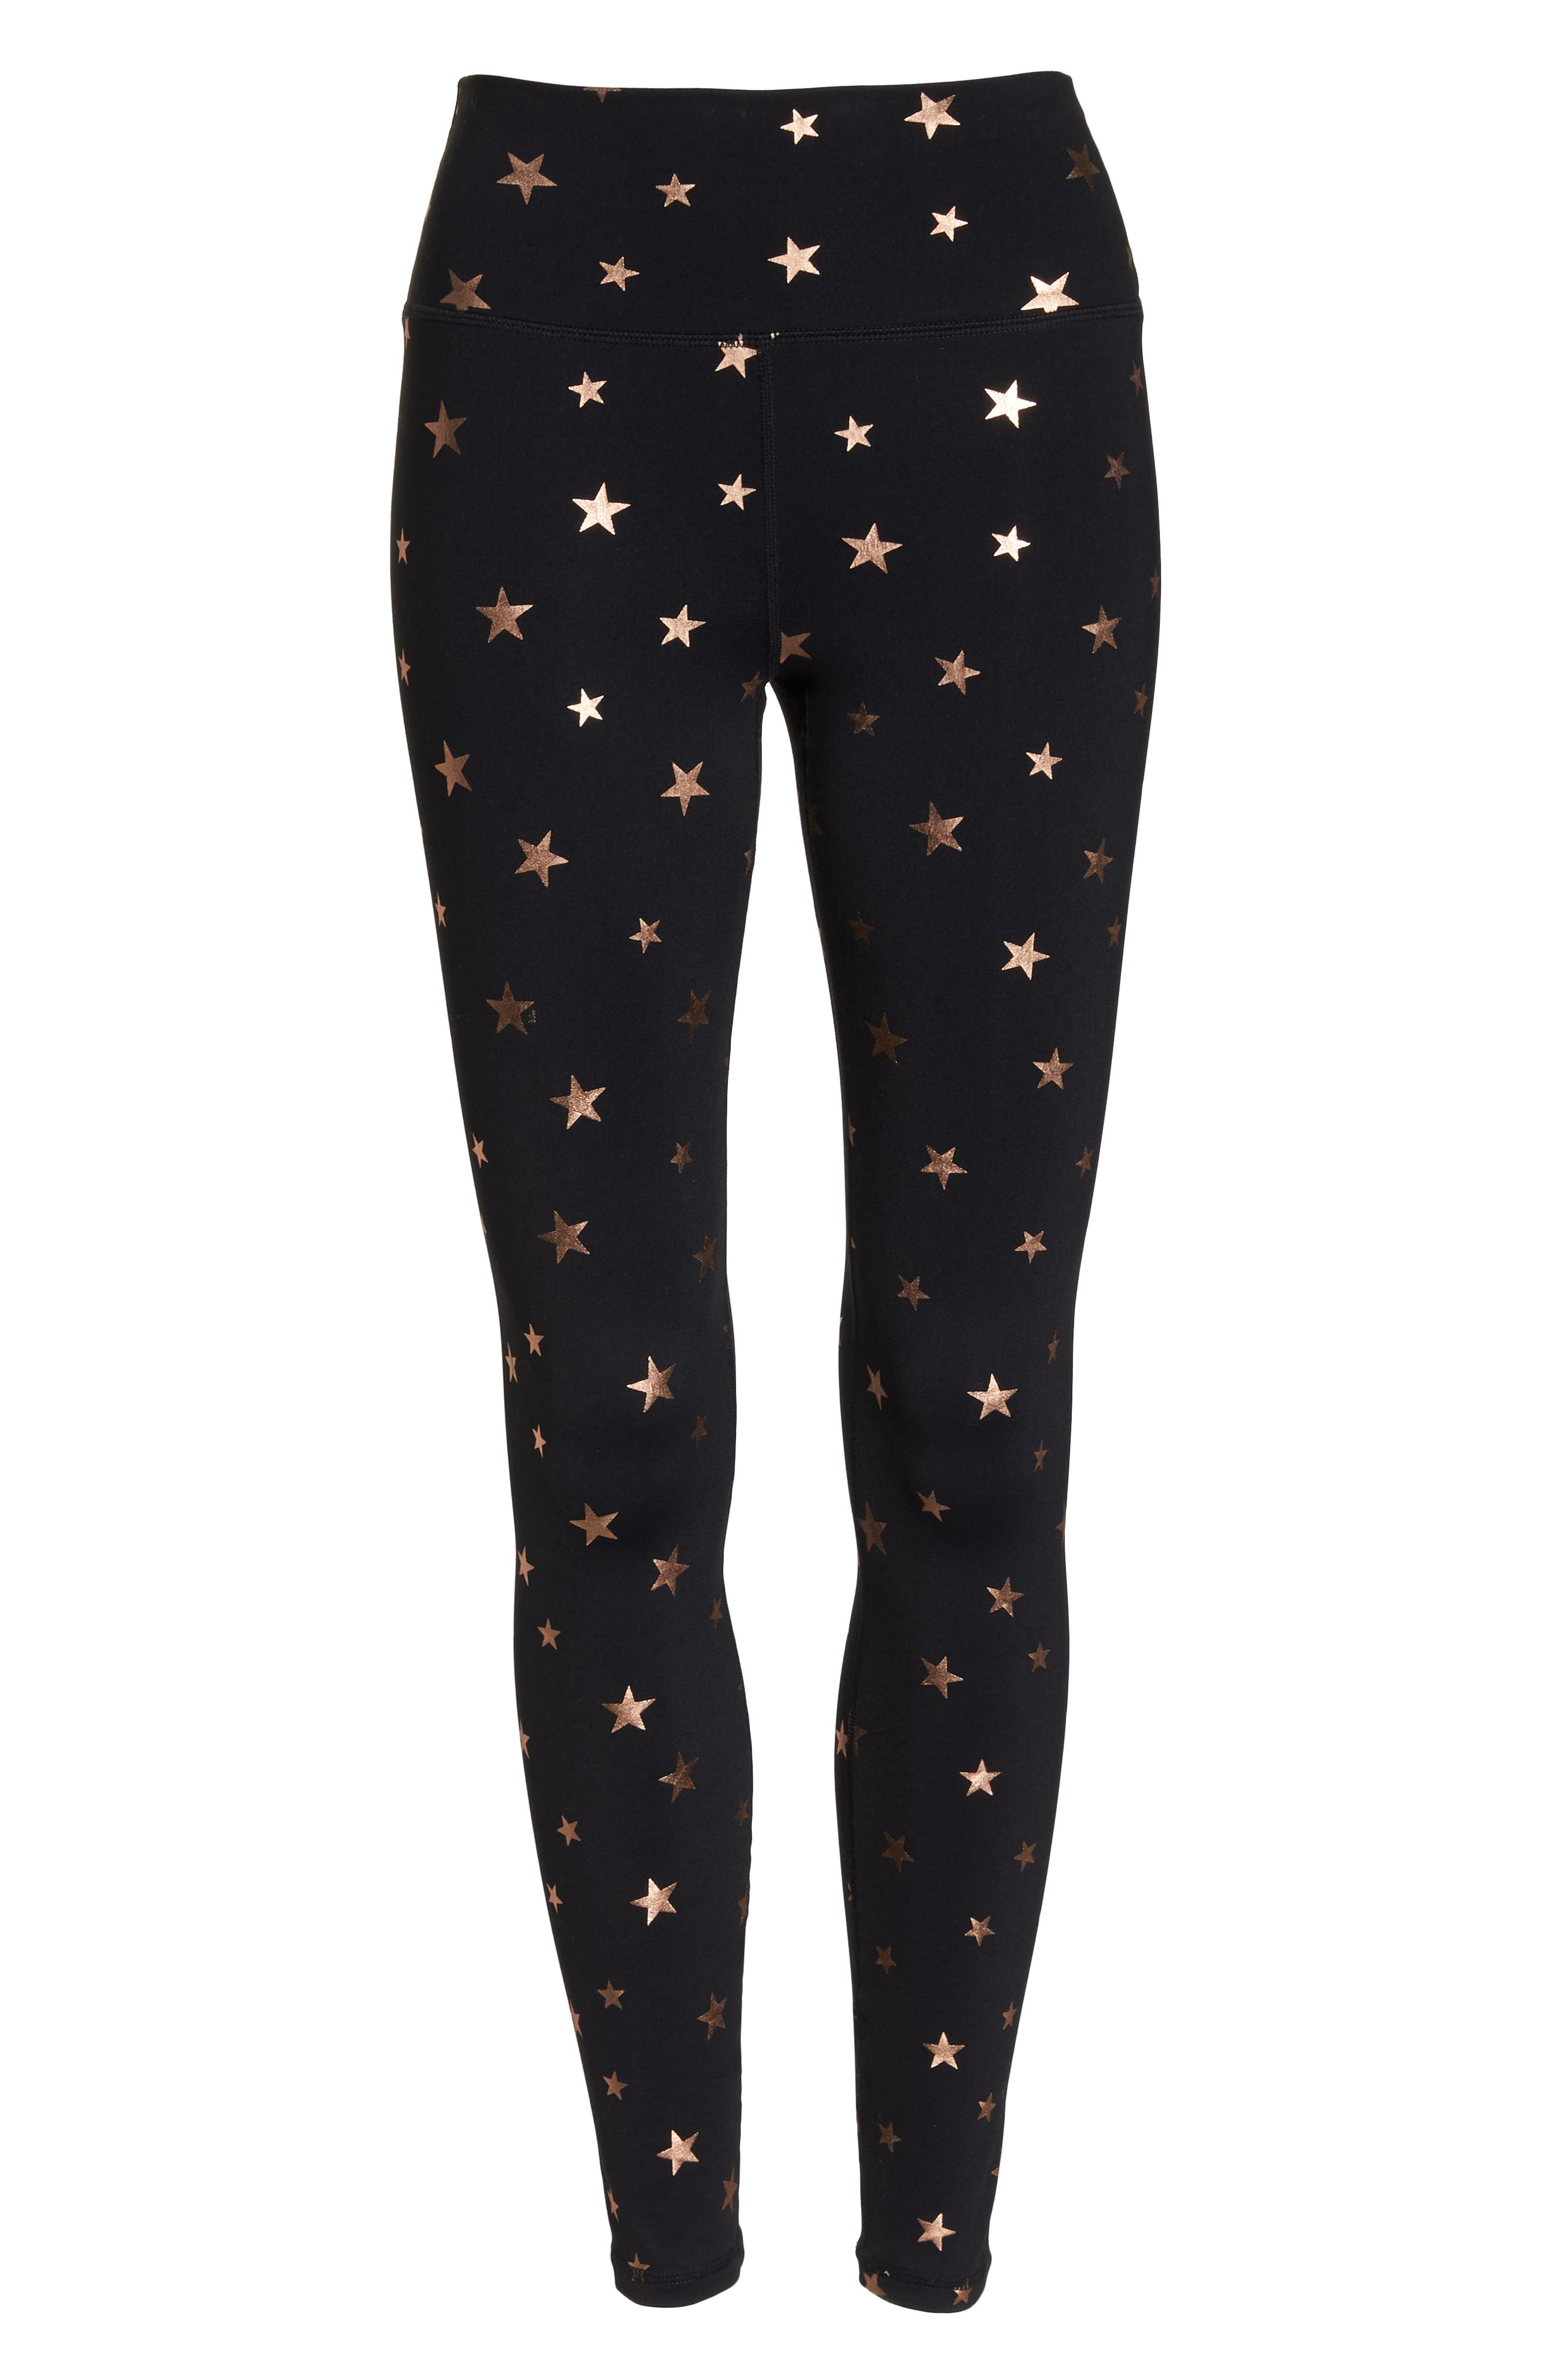 Starry Vibes Perfect High Waist Leggings,                             Alternate thumbnail 7, color,                             003